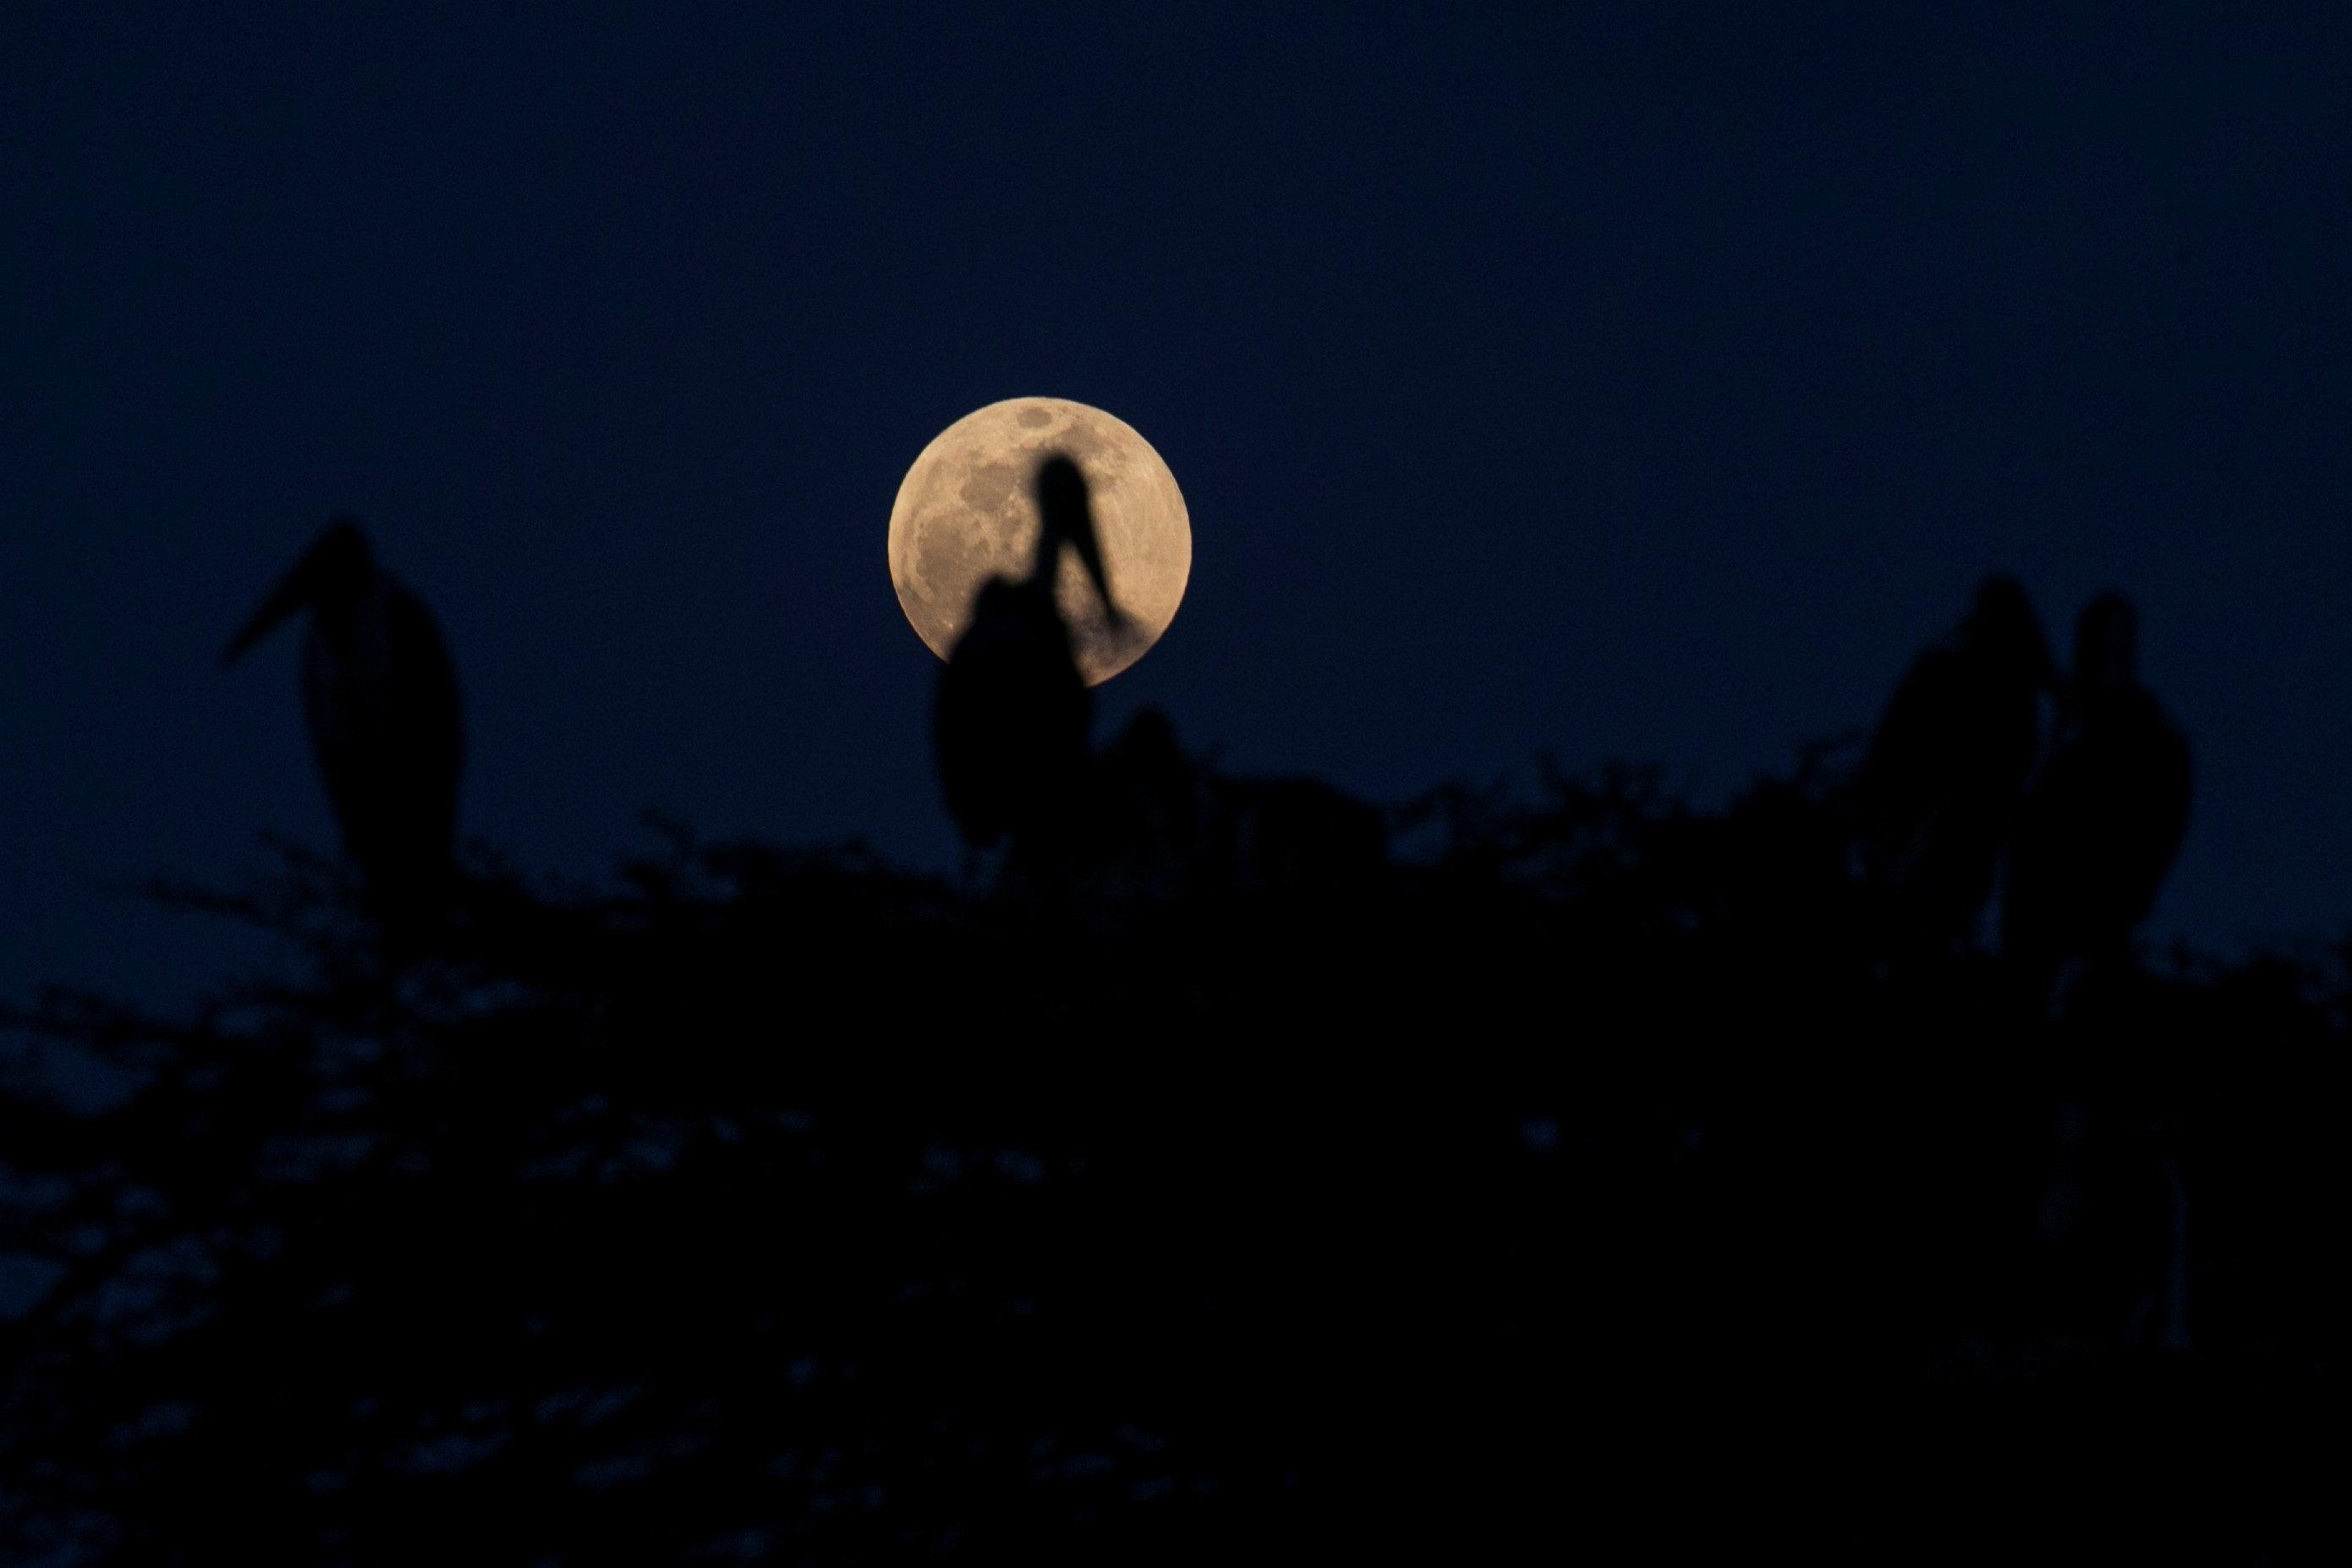 A full moon rises over Marabou storks nesting in a tree in Nairobi